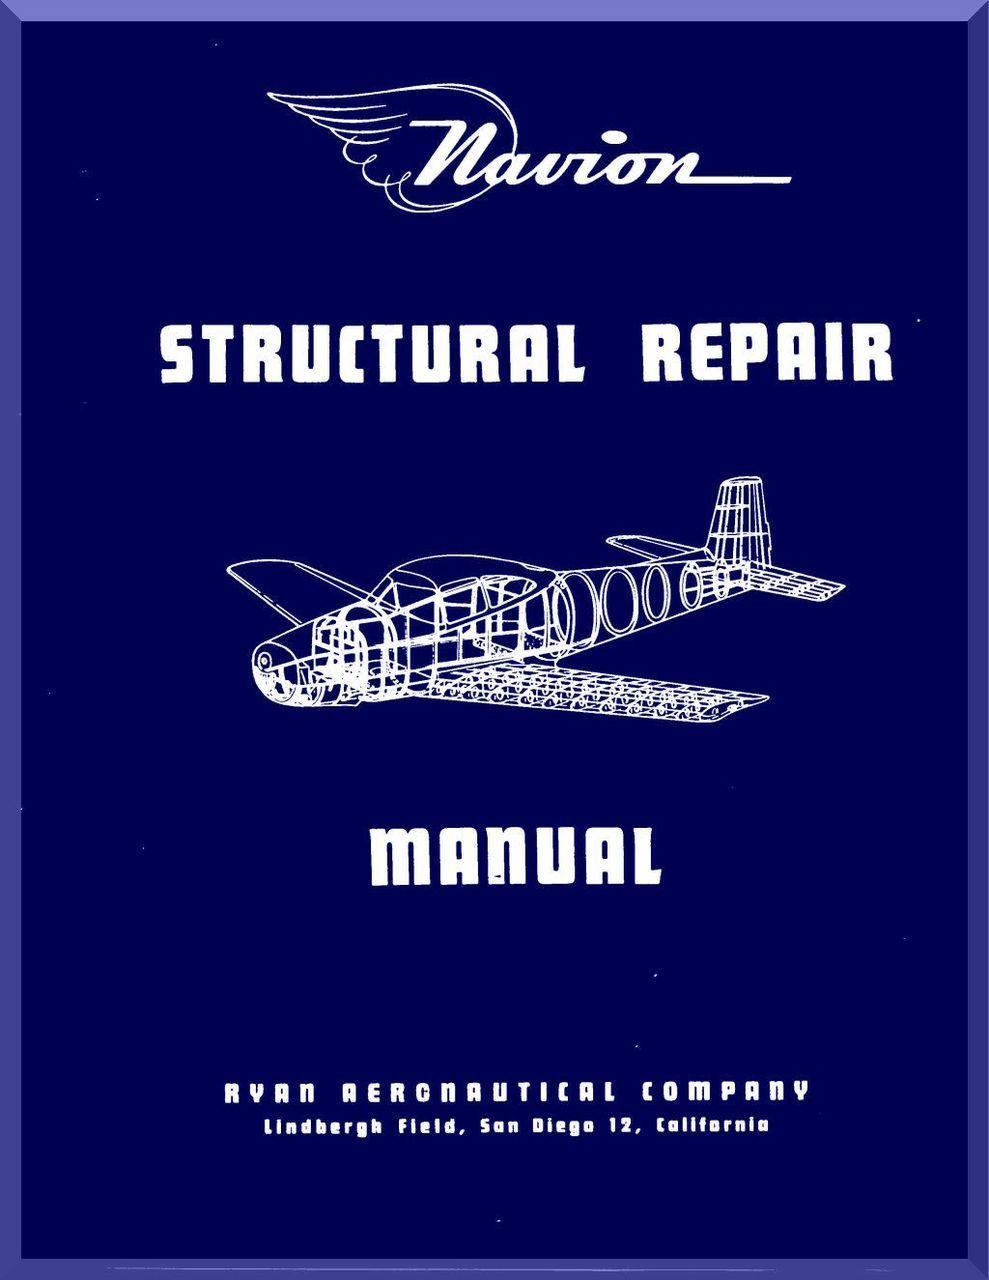 ryan navion airplane structural repair manual 1947 aircraft rh pinterest com aircraft repair manual by larry reithmaier pdf aircraft structural repair manuals